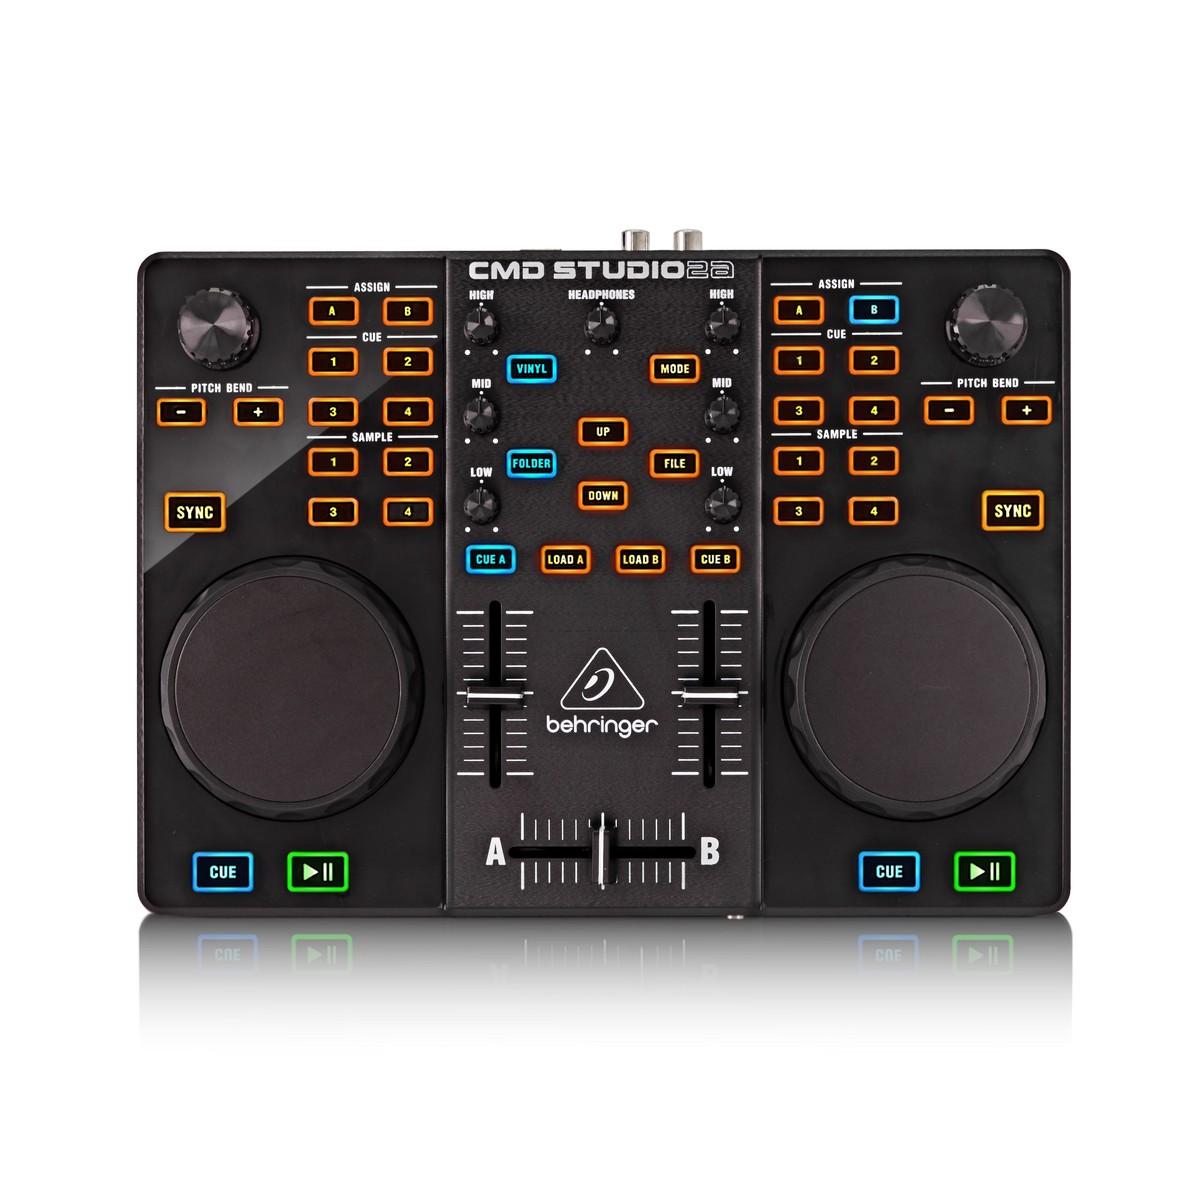 Behringer Dj Controller Cmd Studio 2a Dj Midi Controller Gear4music